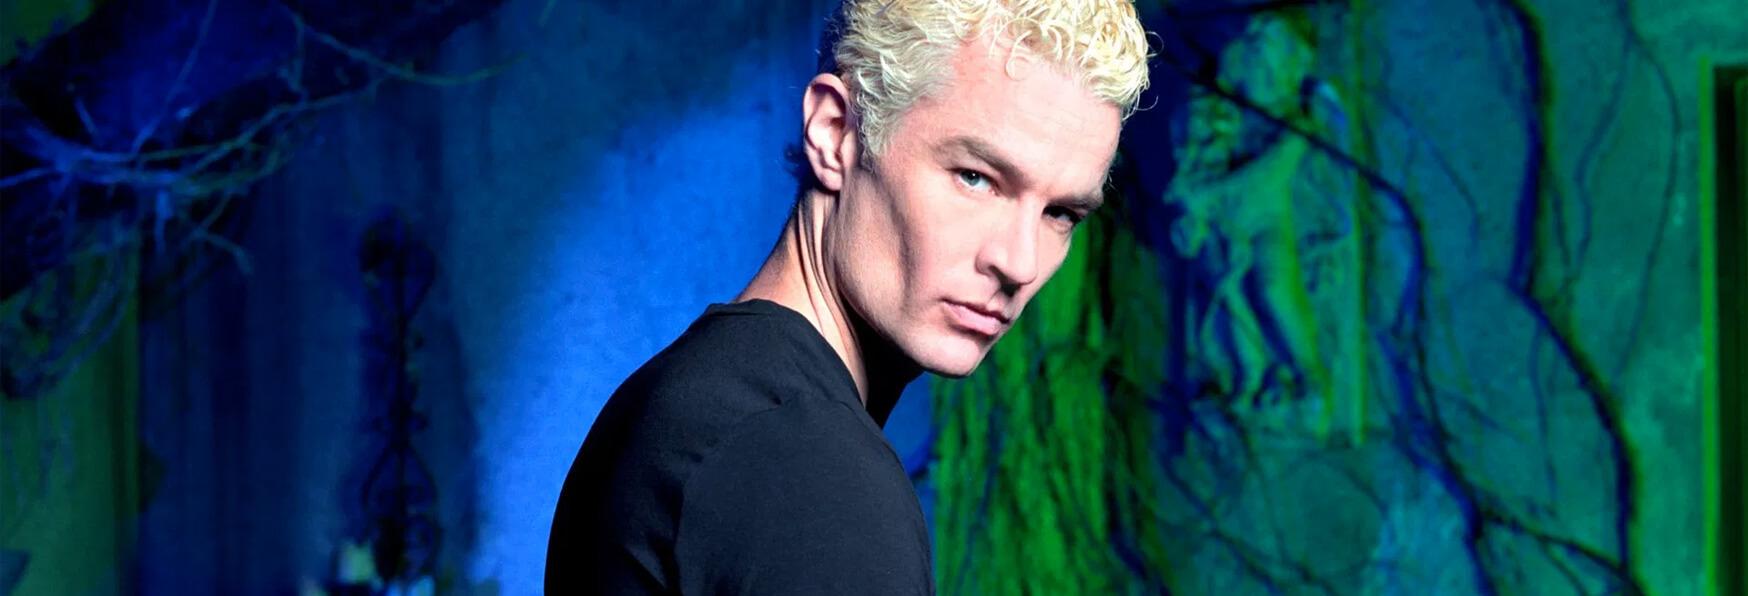 Remake di Buffy: James Marsters vuole tornare a interpretare Spike